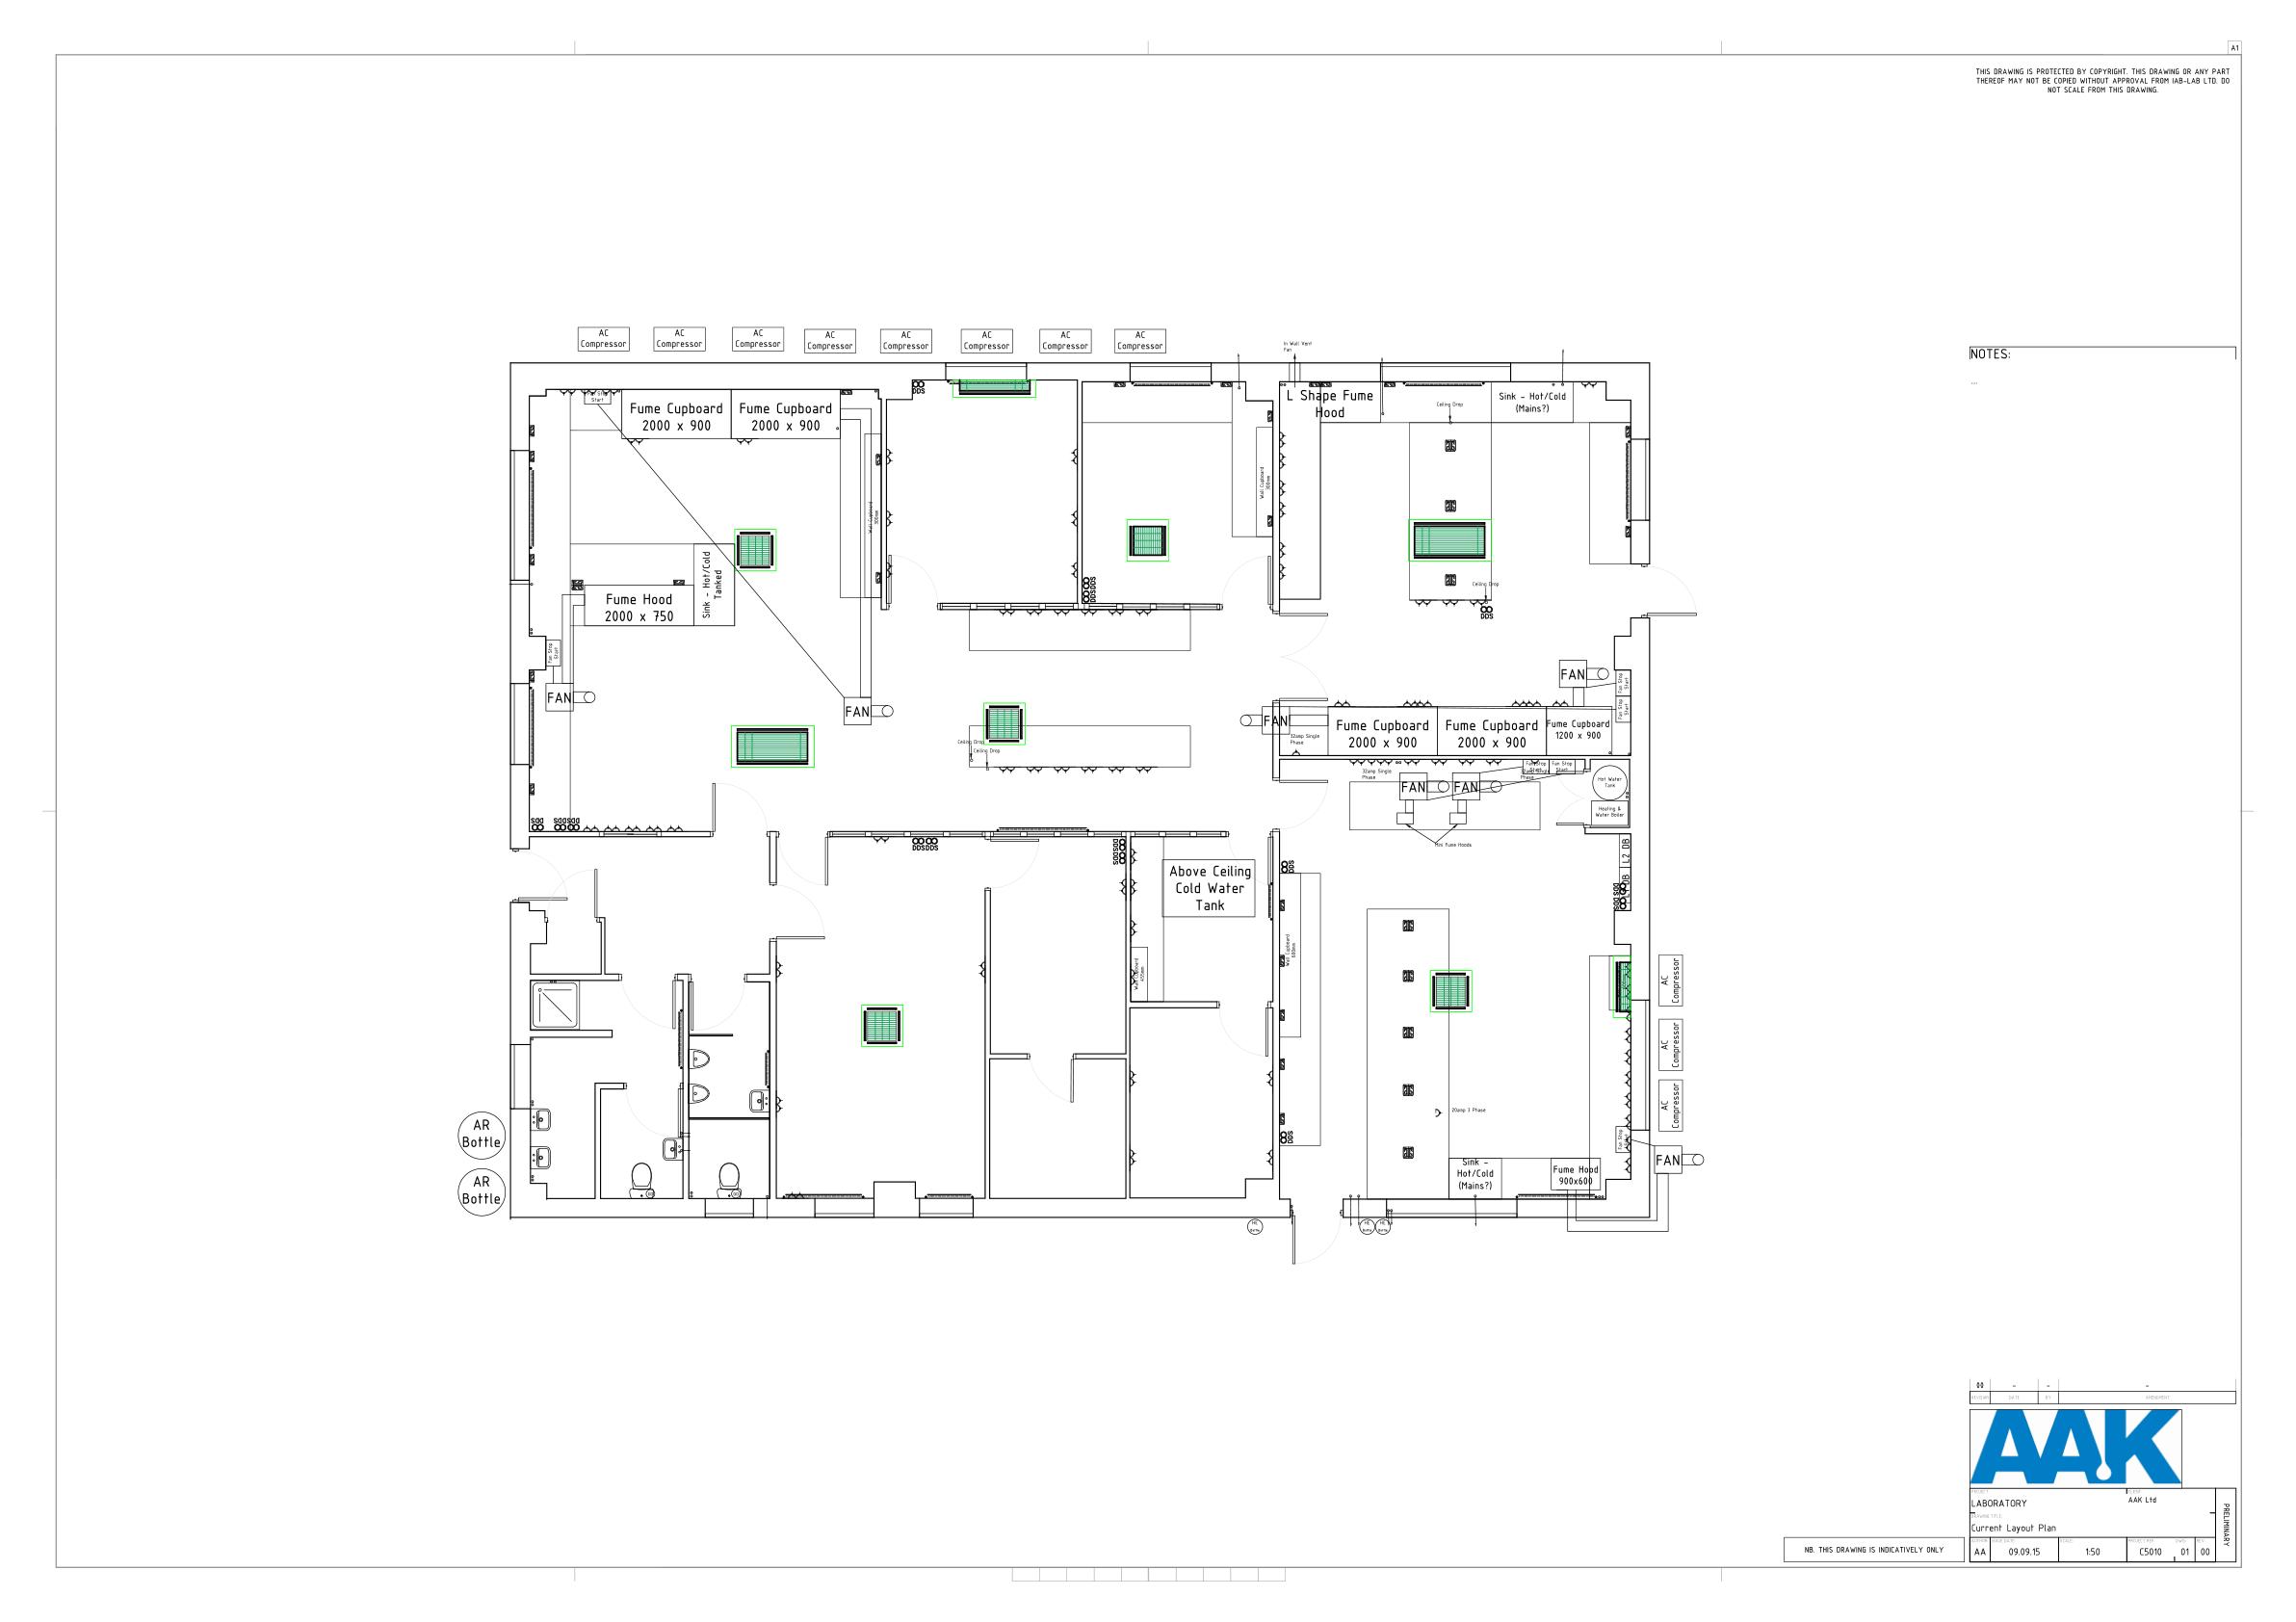 Aarhuskarlshamn aak uk ltd qc laboratory design iab lab for Design lab stuhl